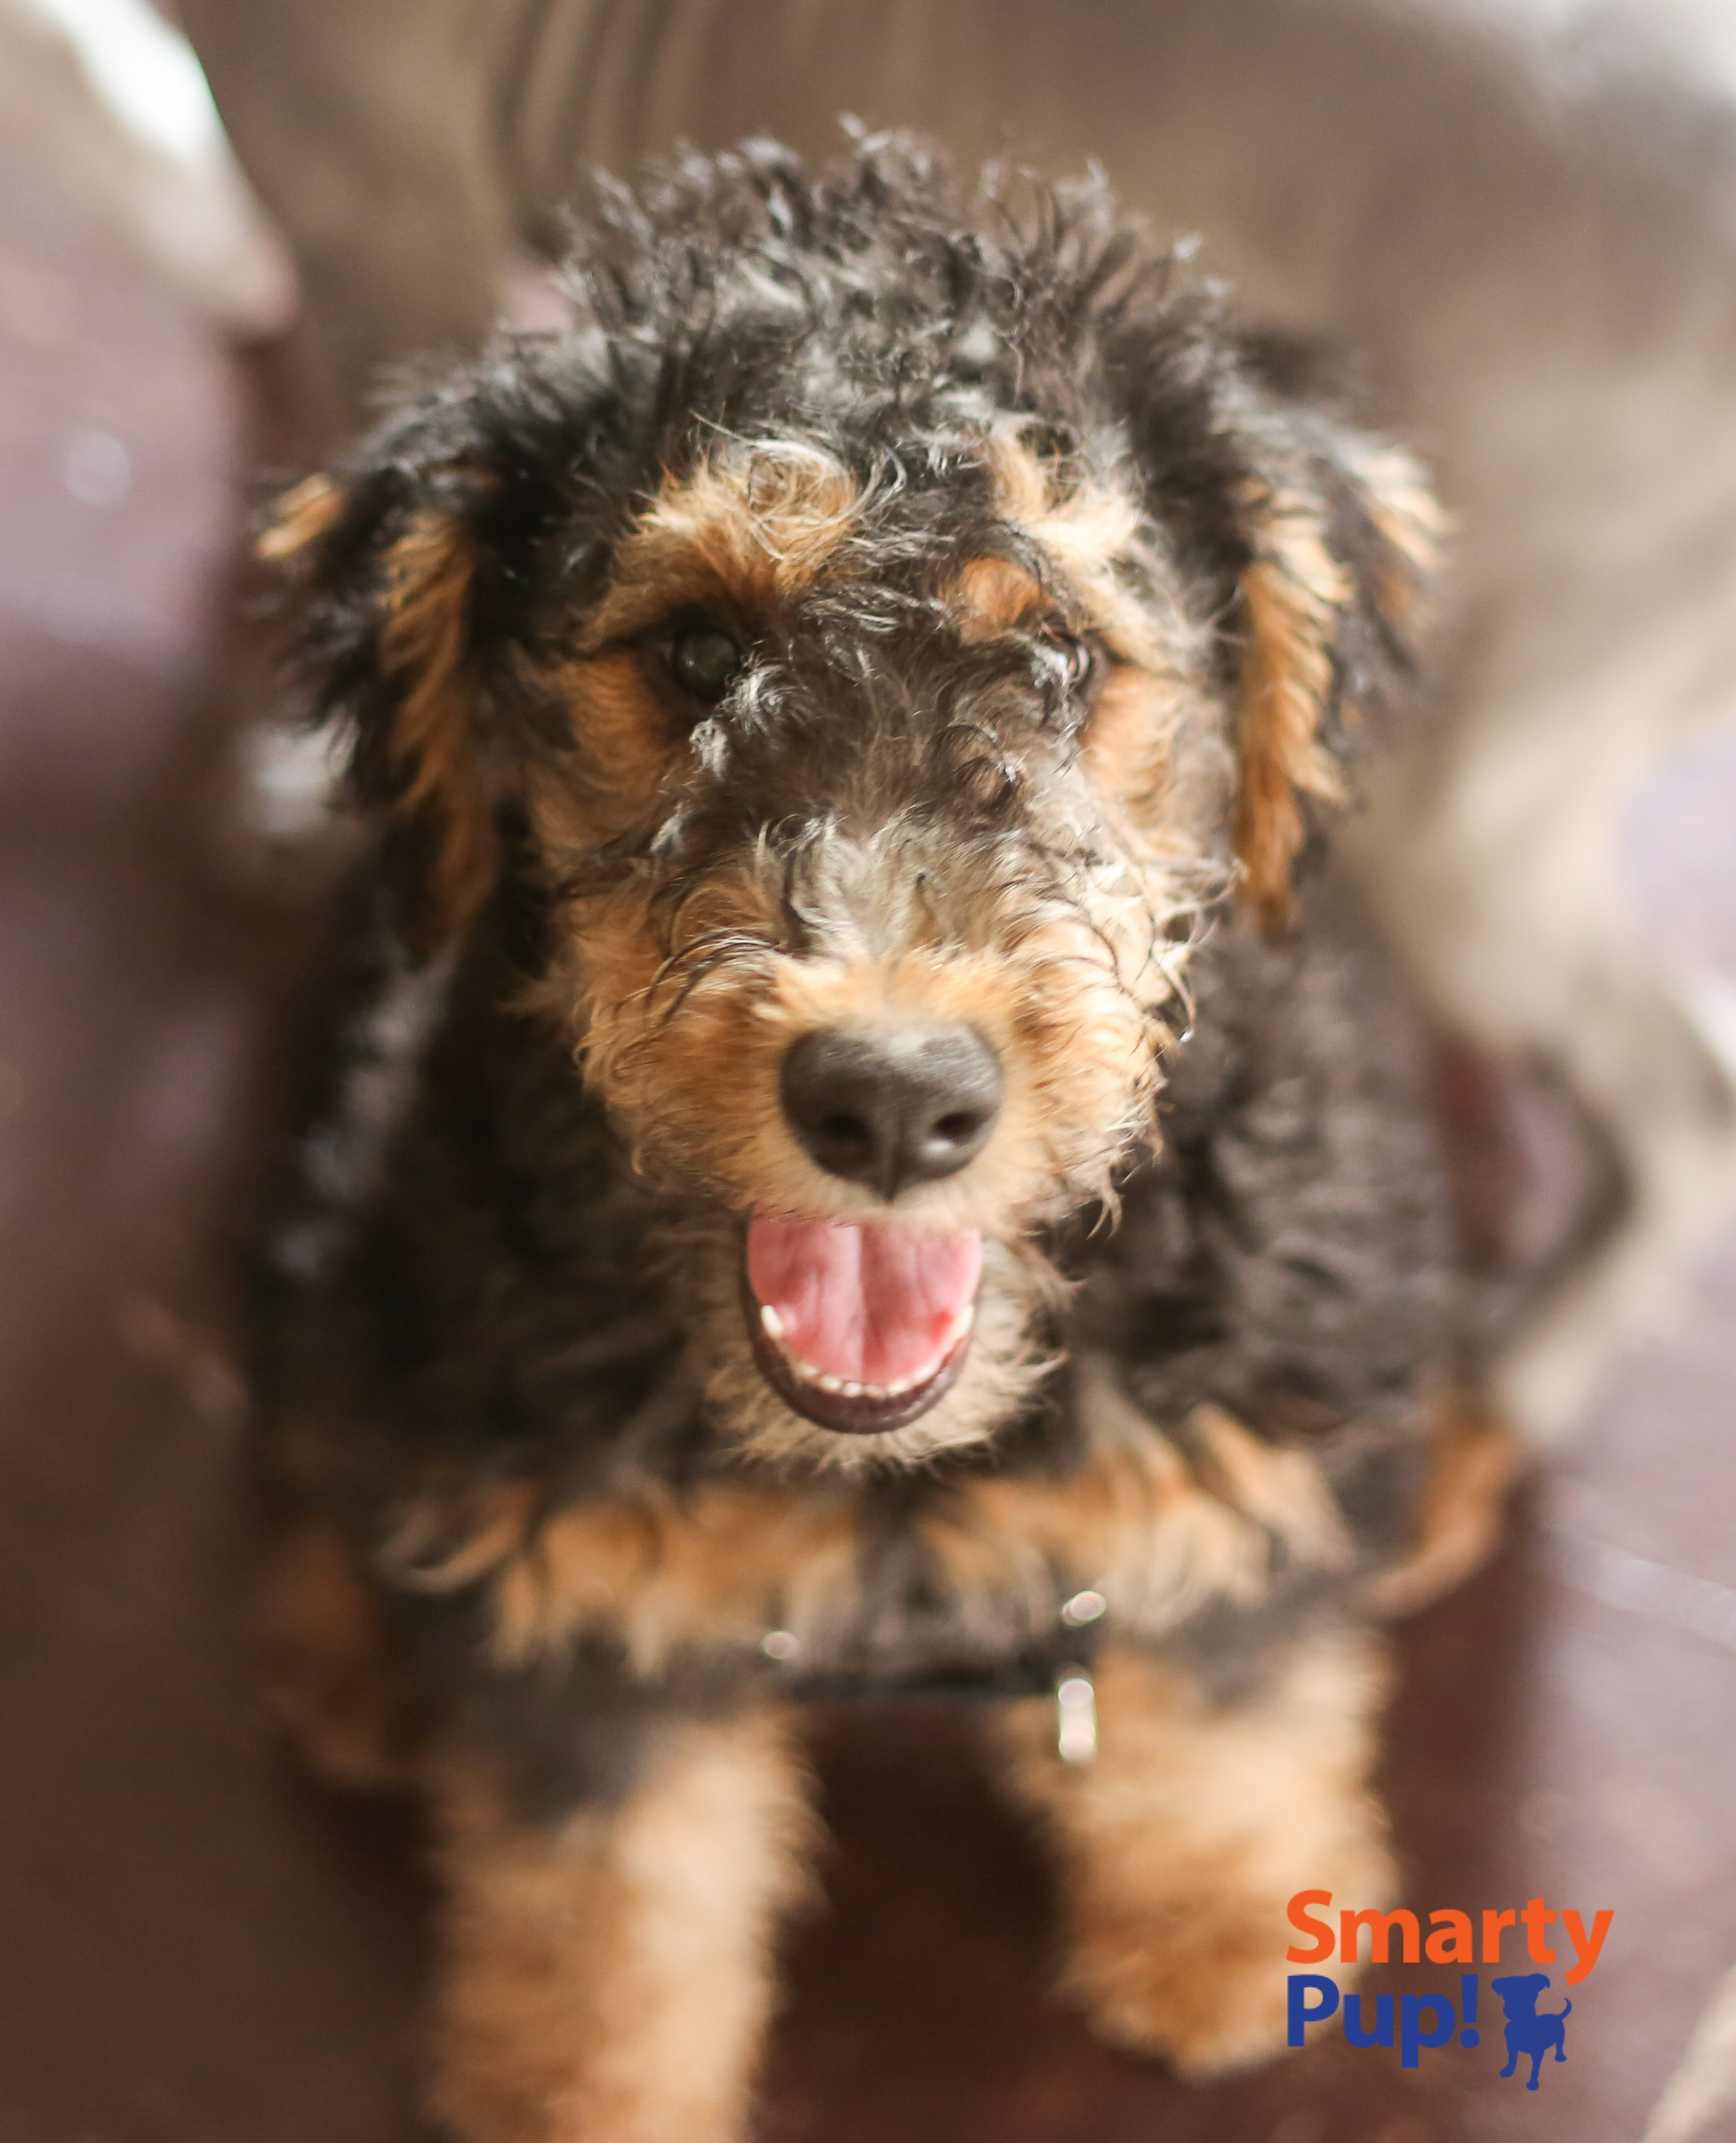 puppy-piles-2104-03-08-0991.jpg